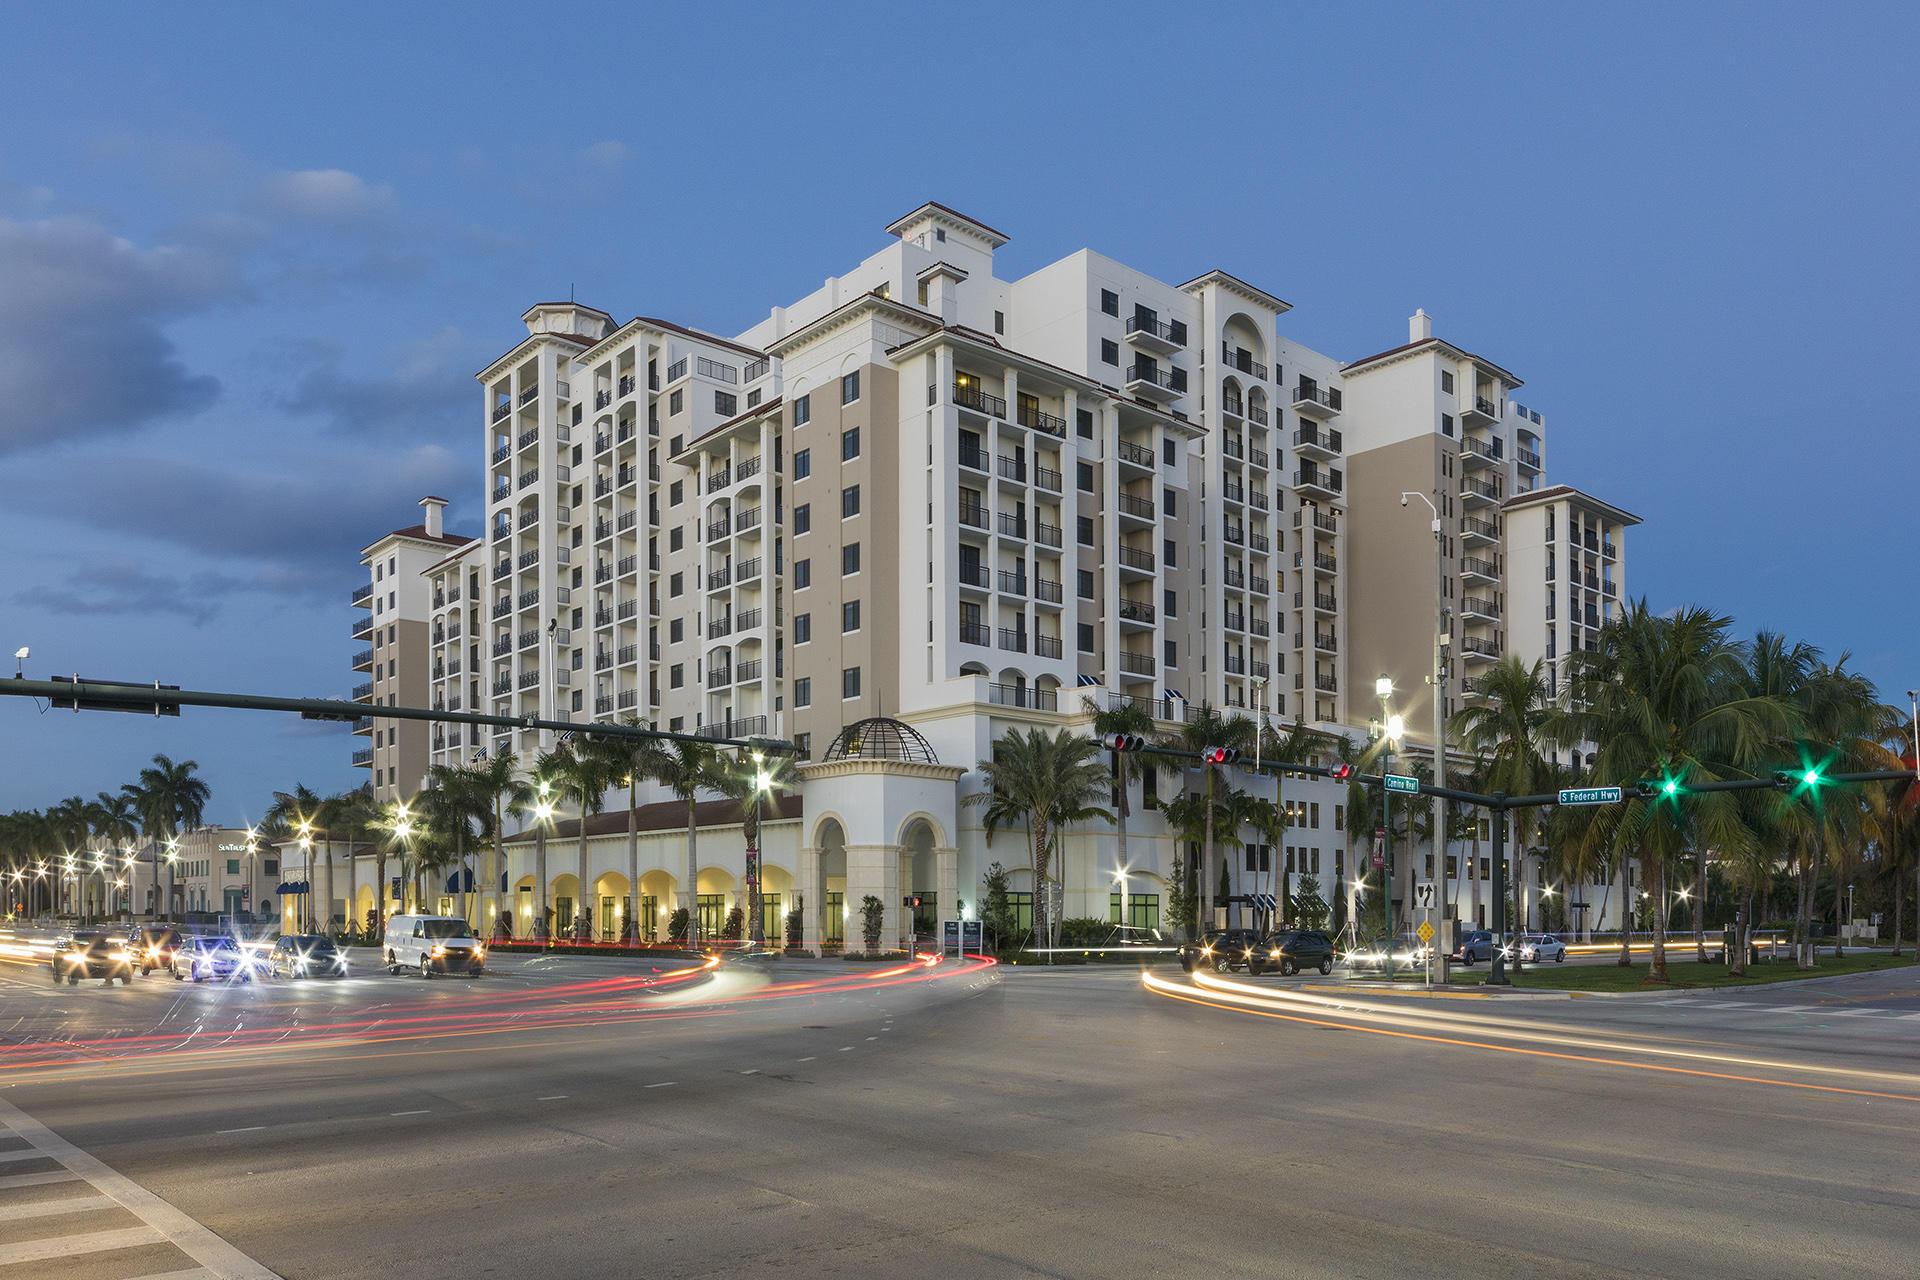 101 Camino Real 828, Boca Raton, Florida 33432, 1 Bedroom Bedrooms, ,1 BathroomBathrooms,F,Apartment,Camino Real,RX-10617135